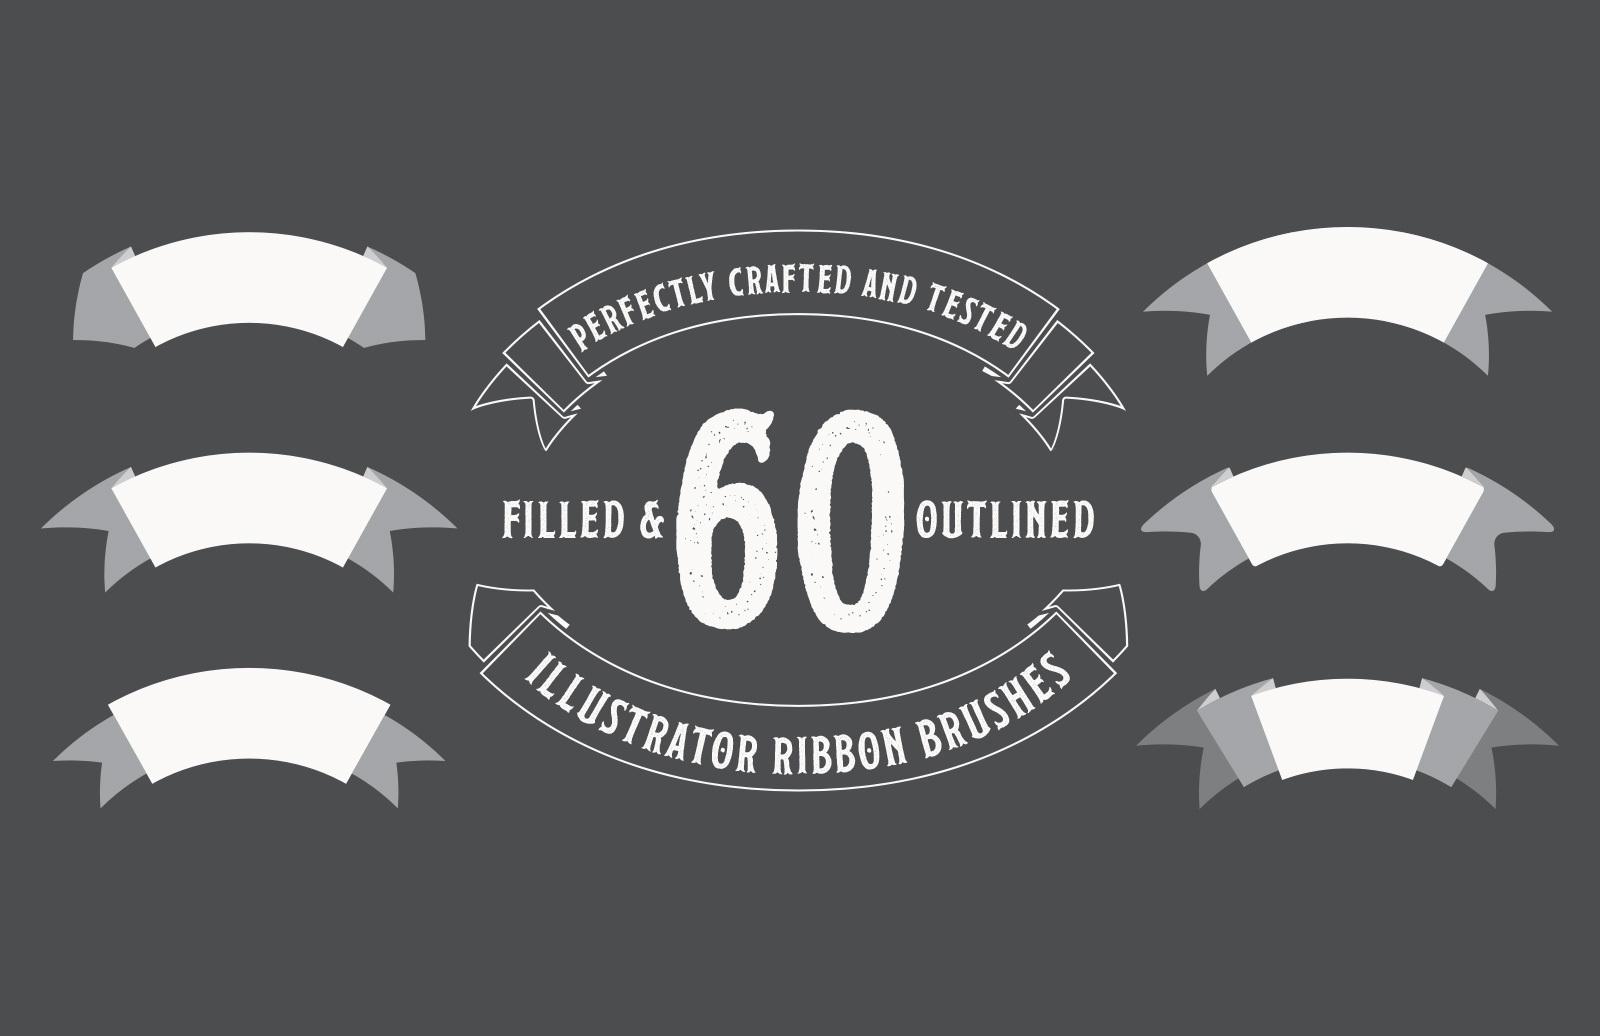 60 Illustratot Ribbon Brushes Preview 1